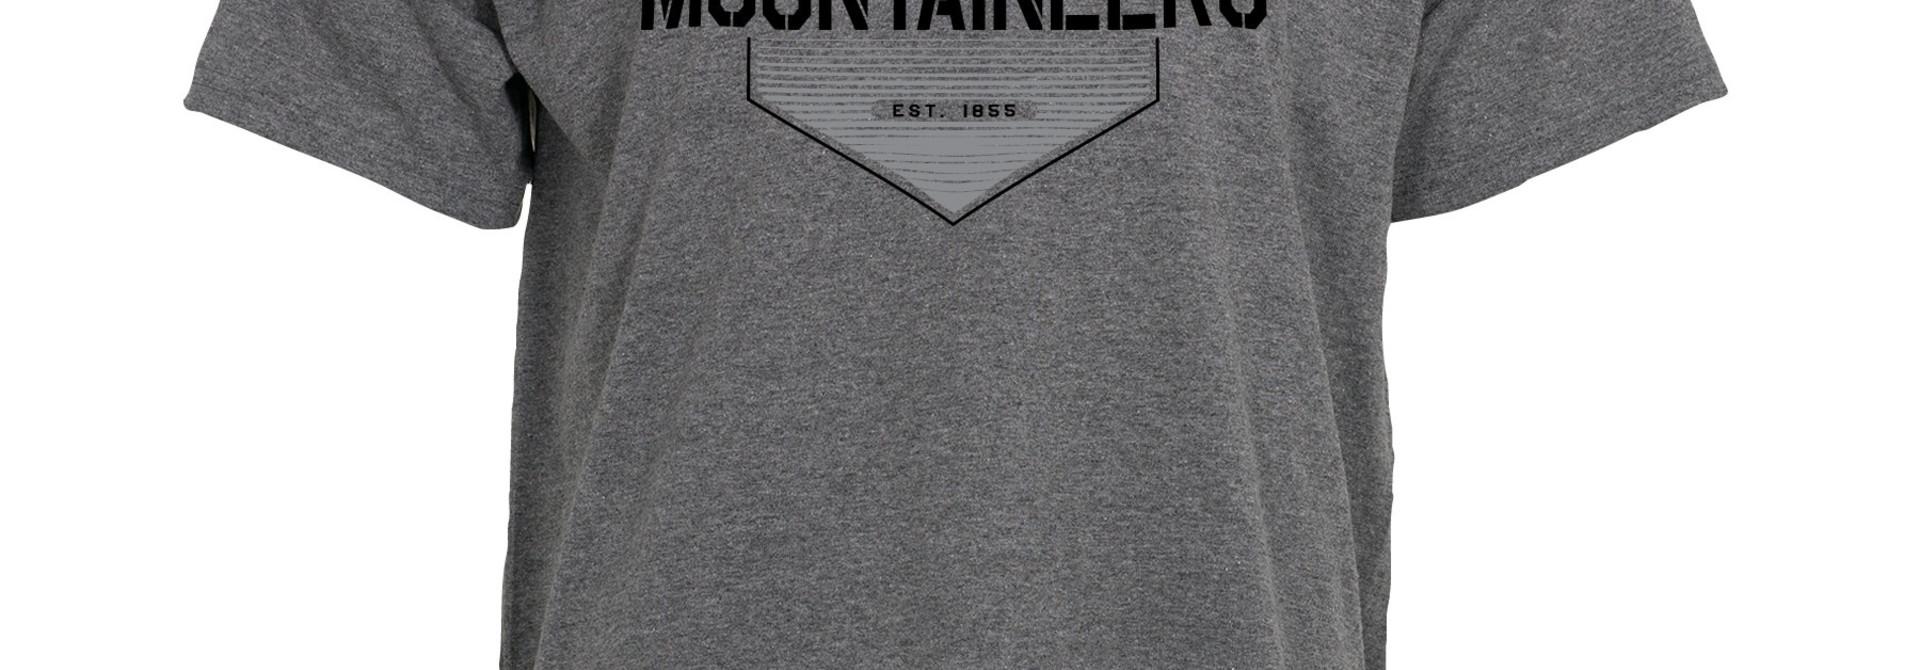 Hexagon BC Mountaineers Est. 1855 T-Shirt